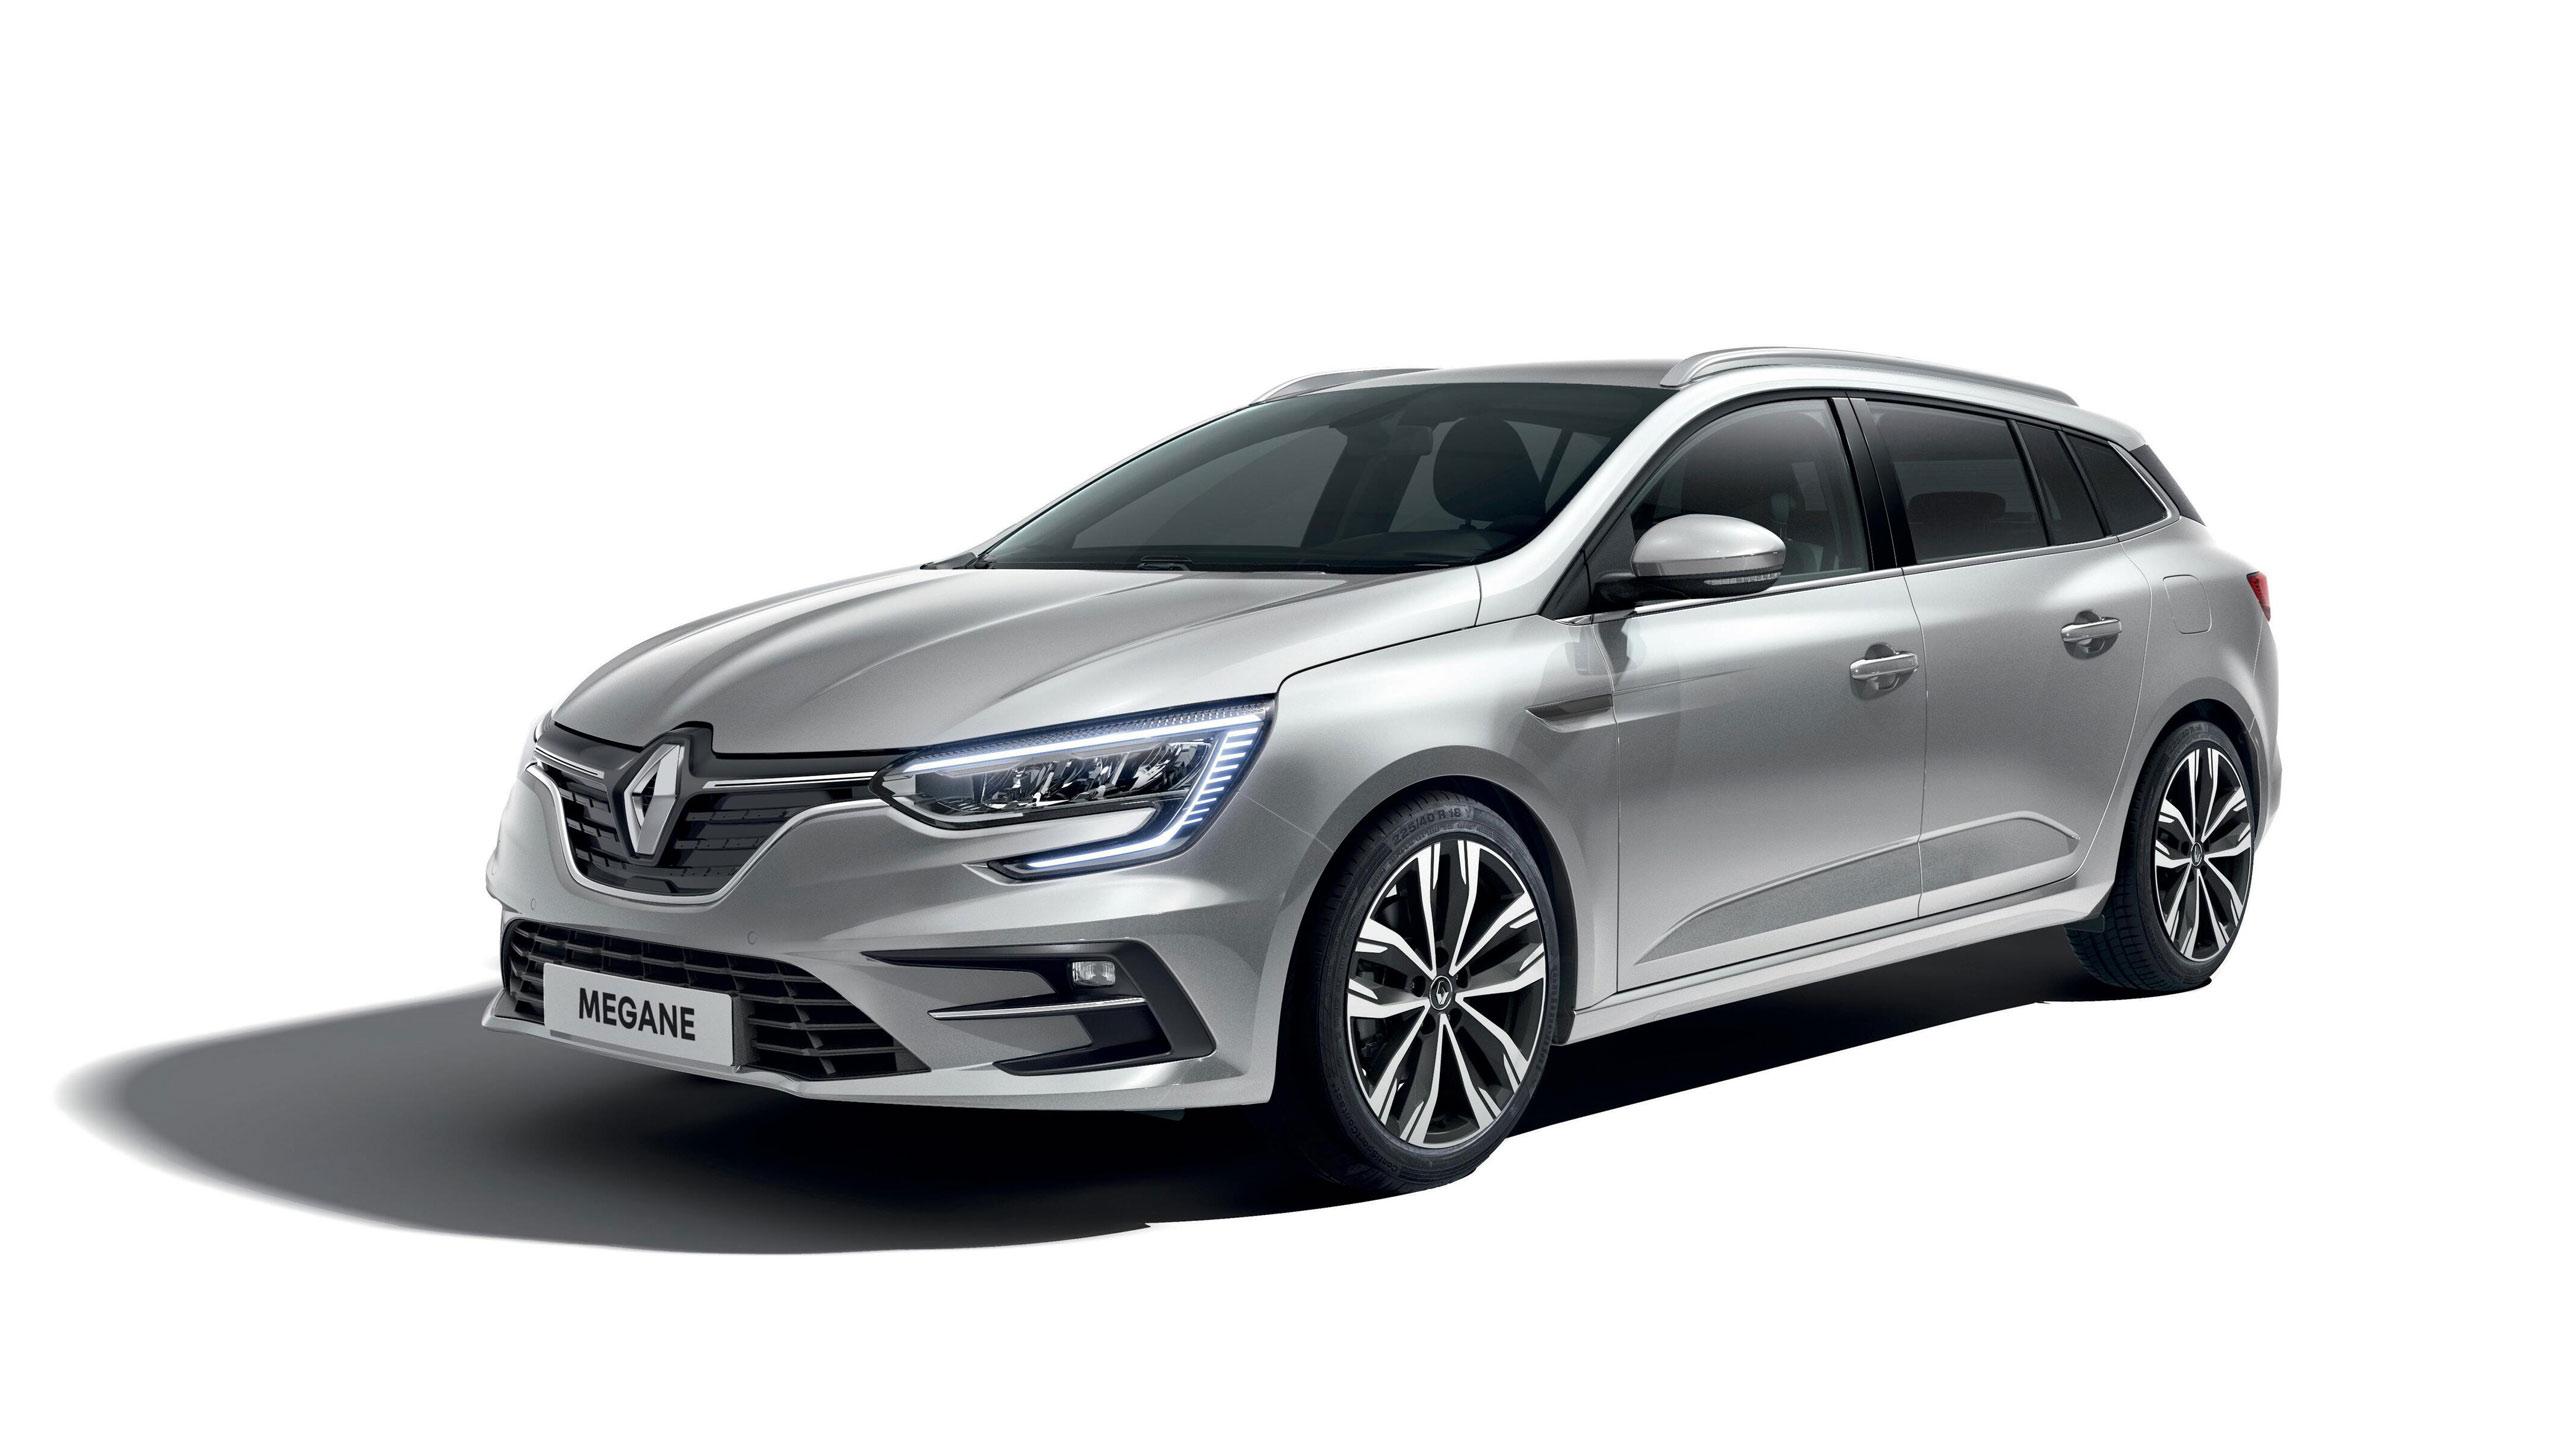 Renault Multi-Sense 4 Control